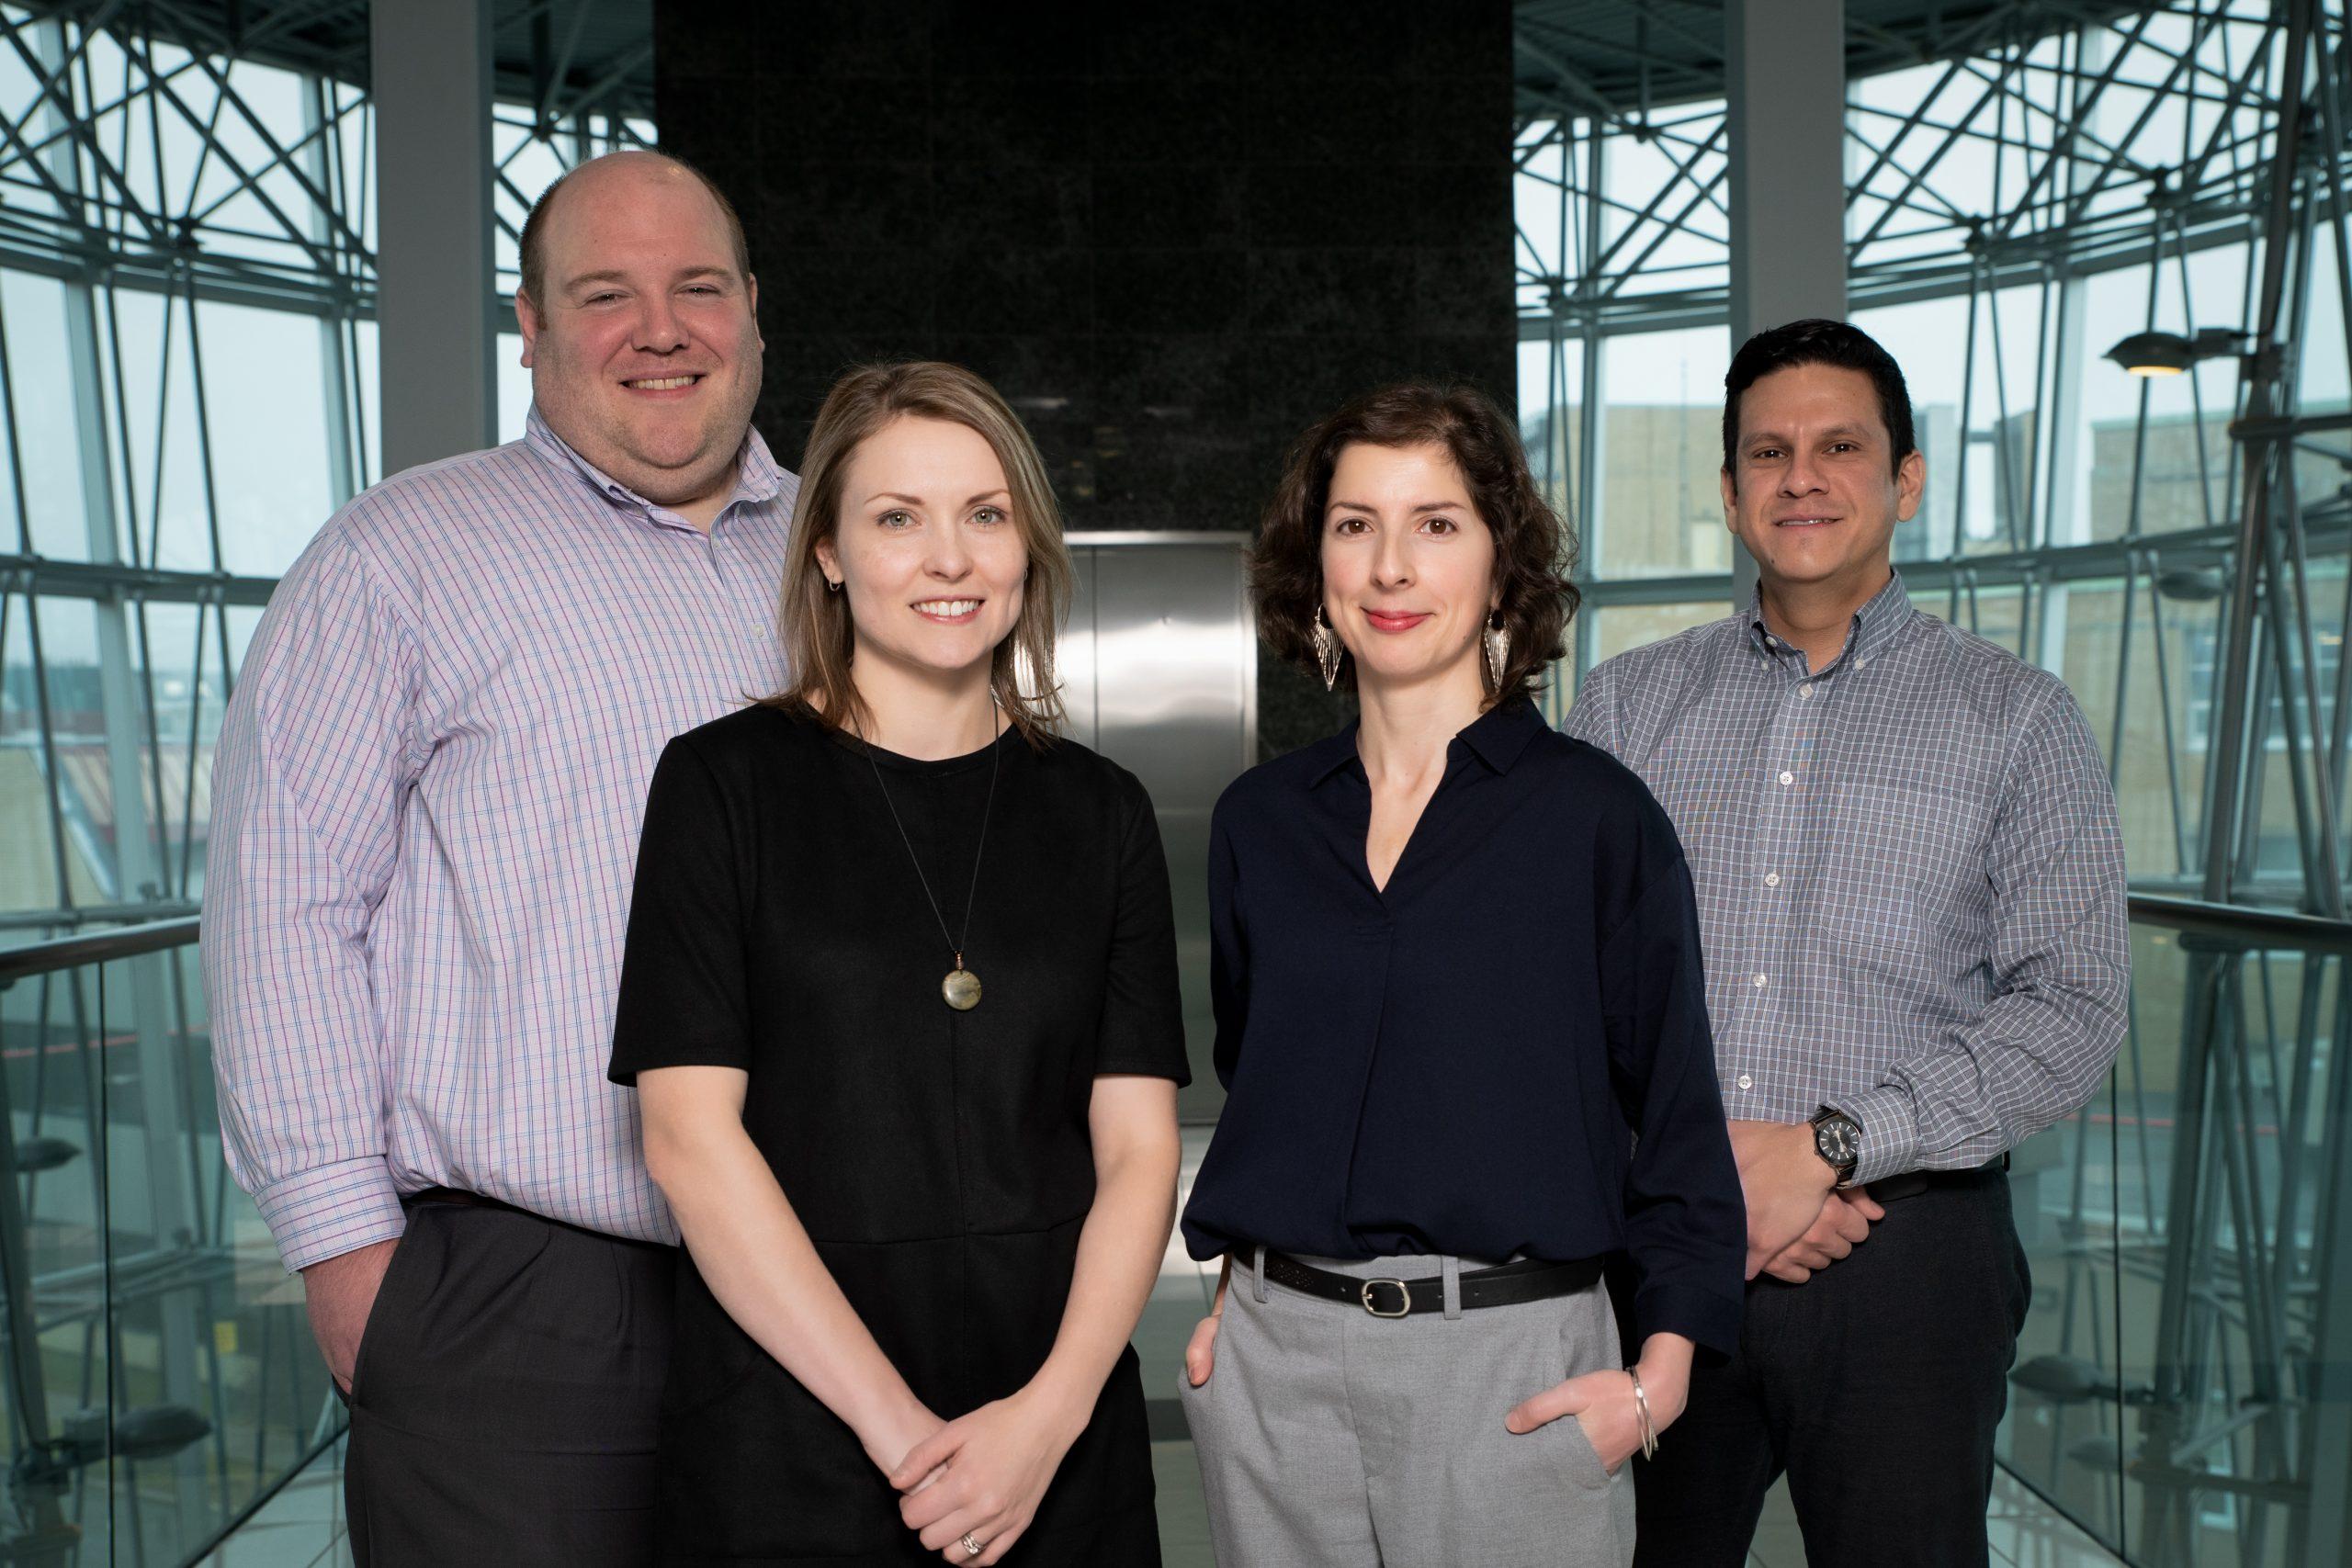 TTCO staff include, from left, Dr. Matt Grimes, Kara Strickland, Dr. Paula Mendonça and Carlos L. Sanyer.